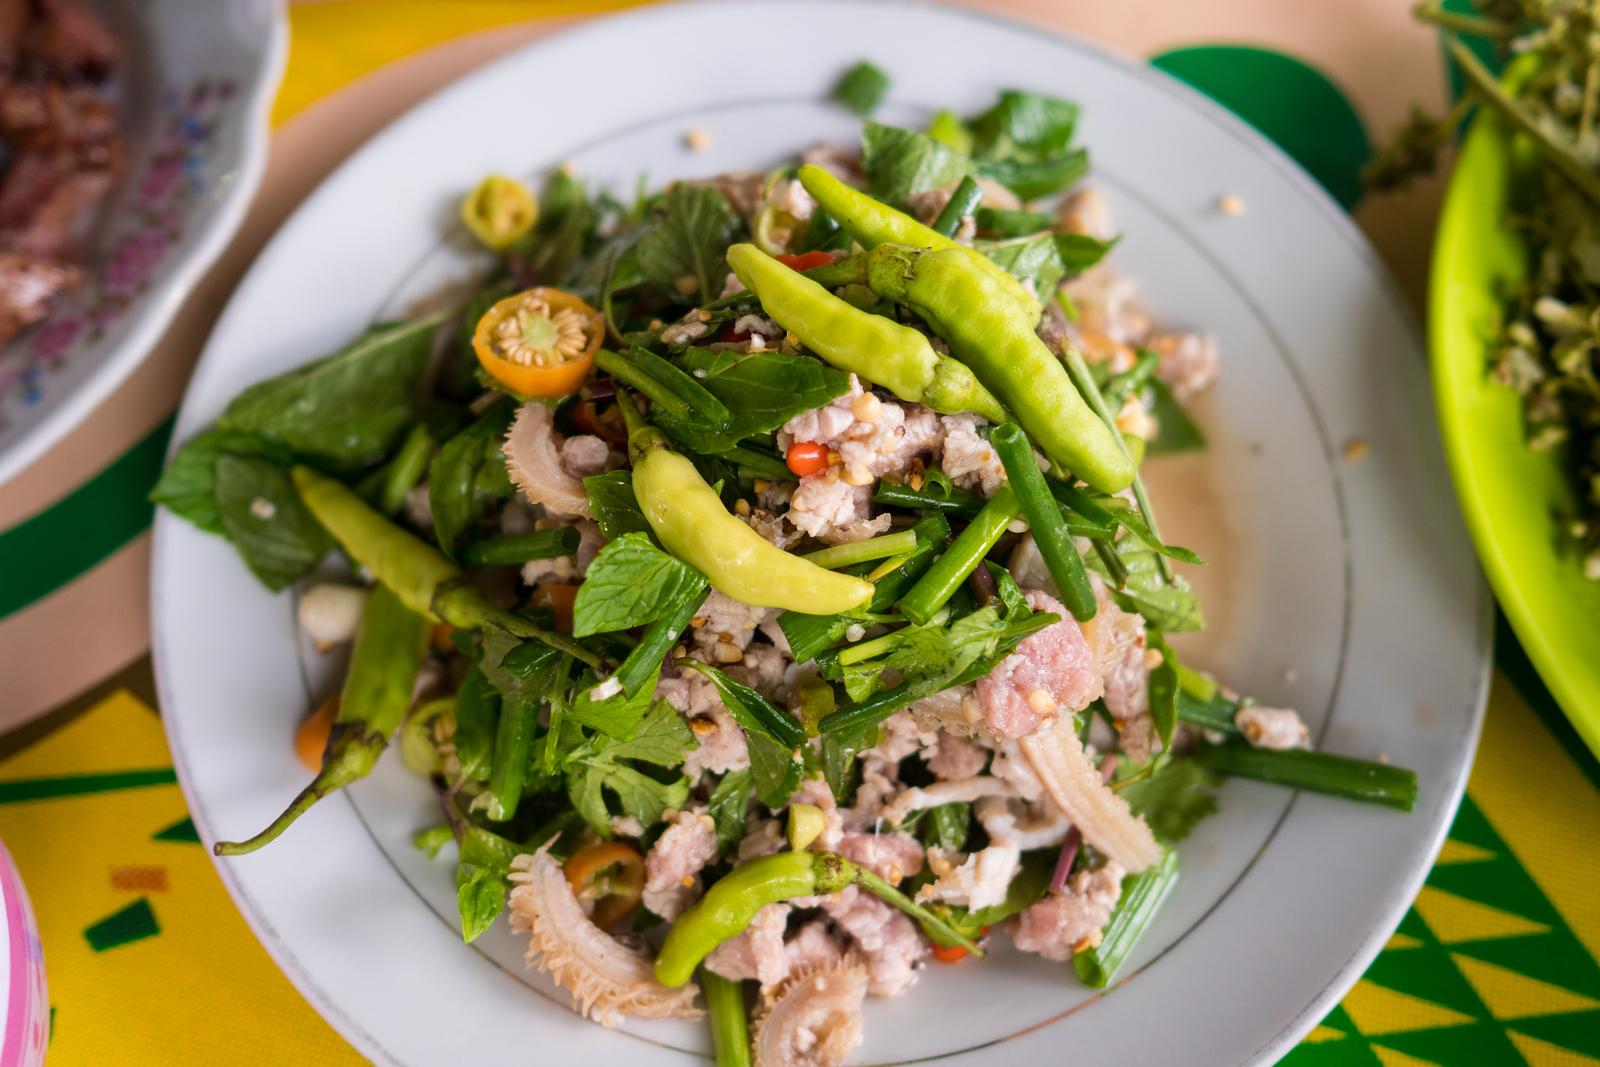 Lao food